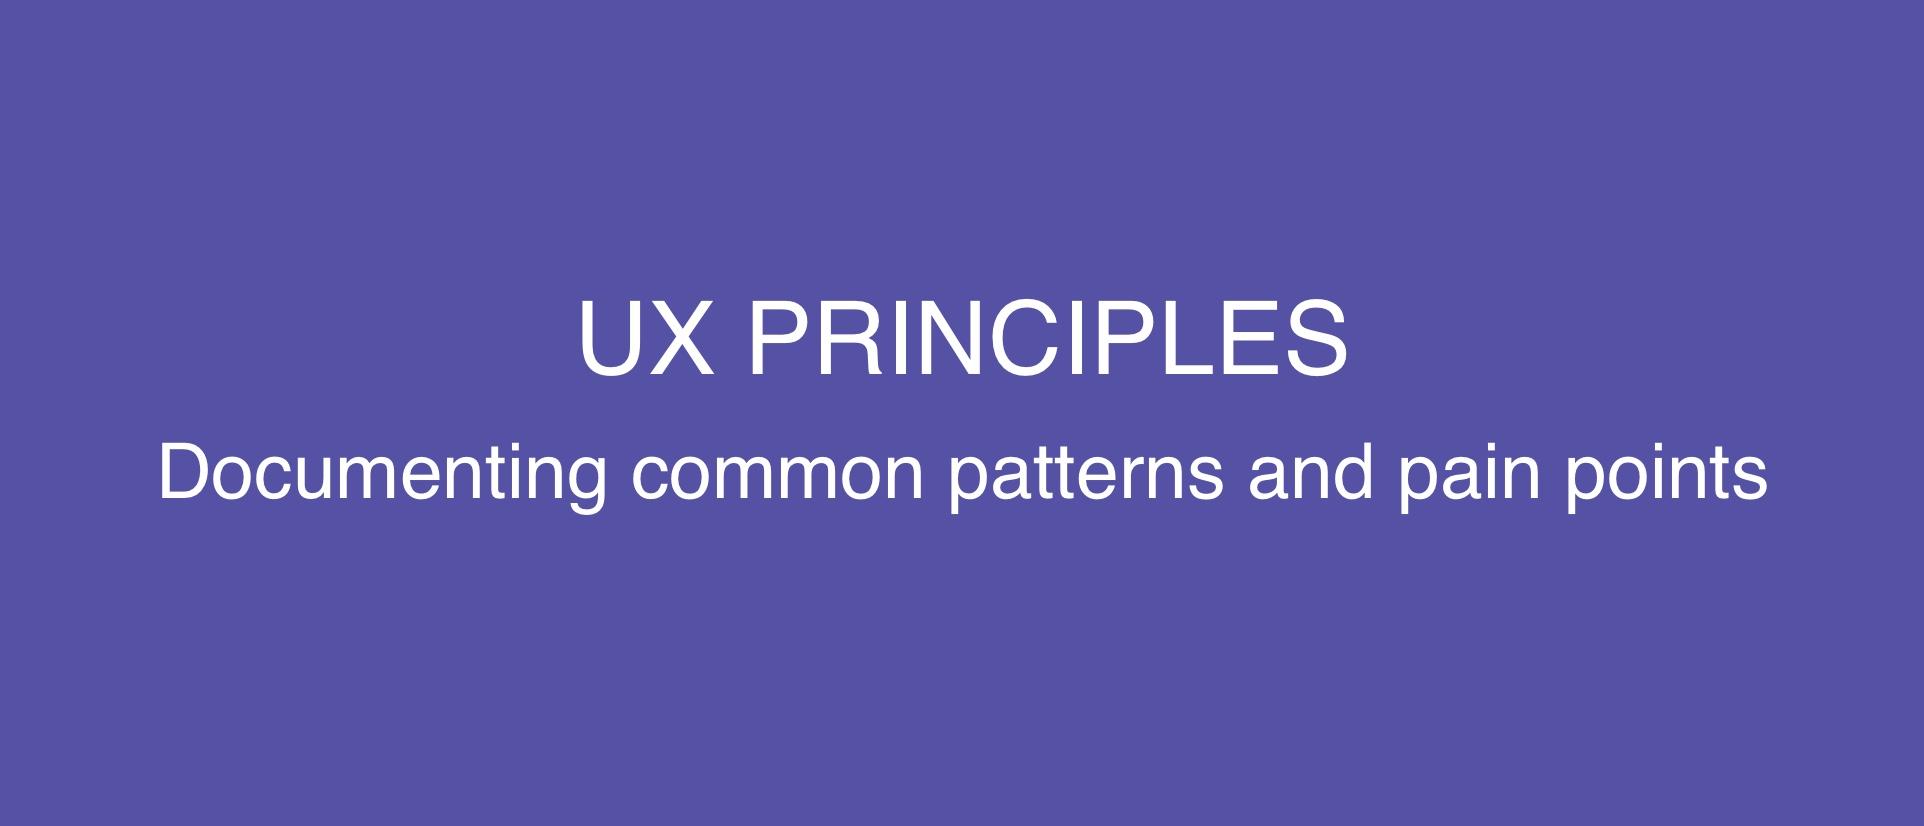 20_ux_principles copy.jpg